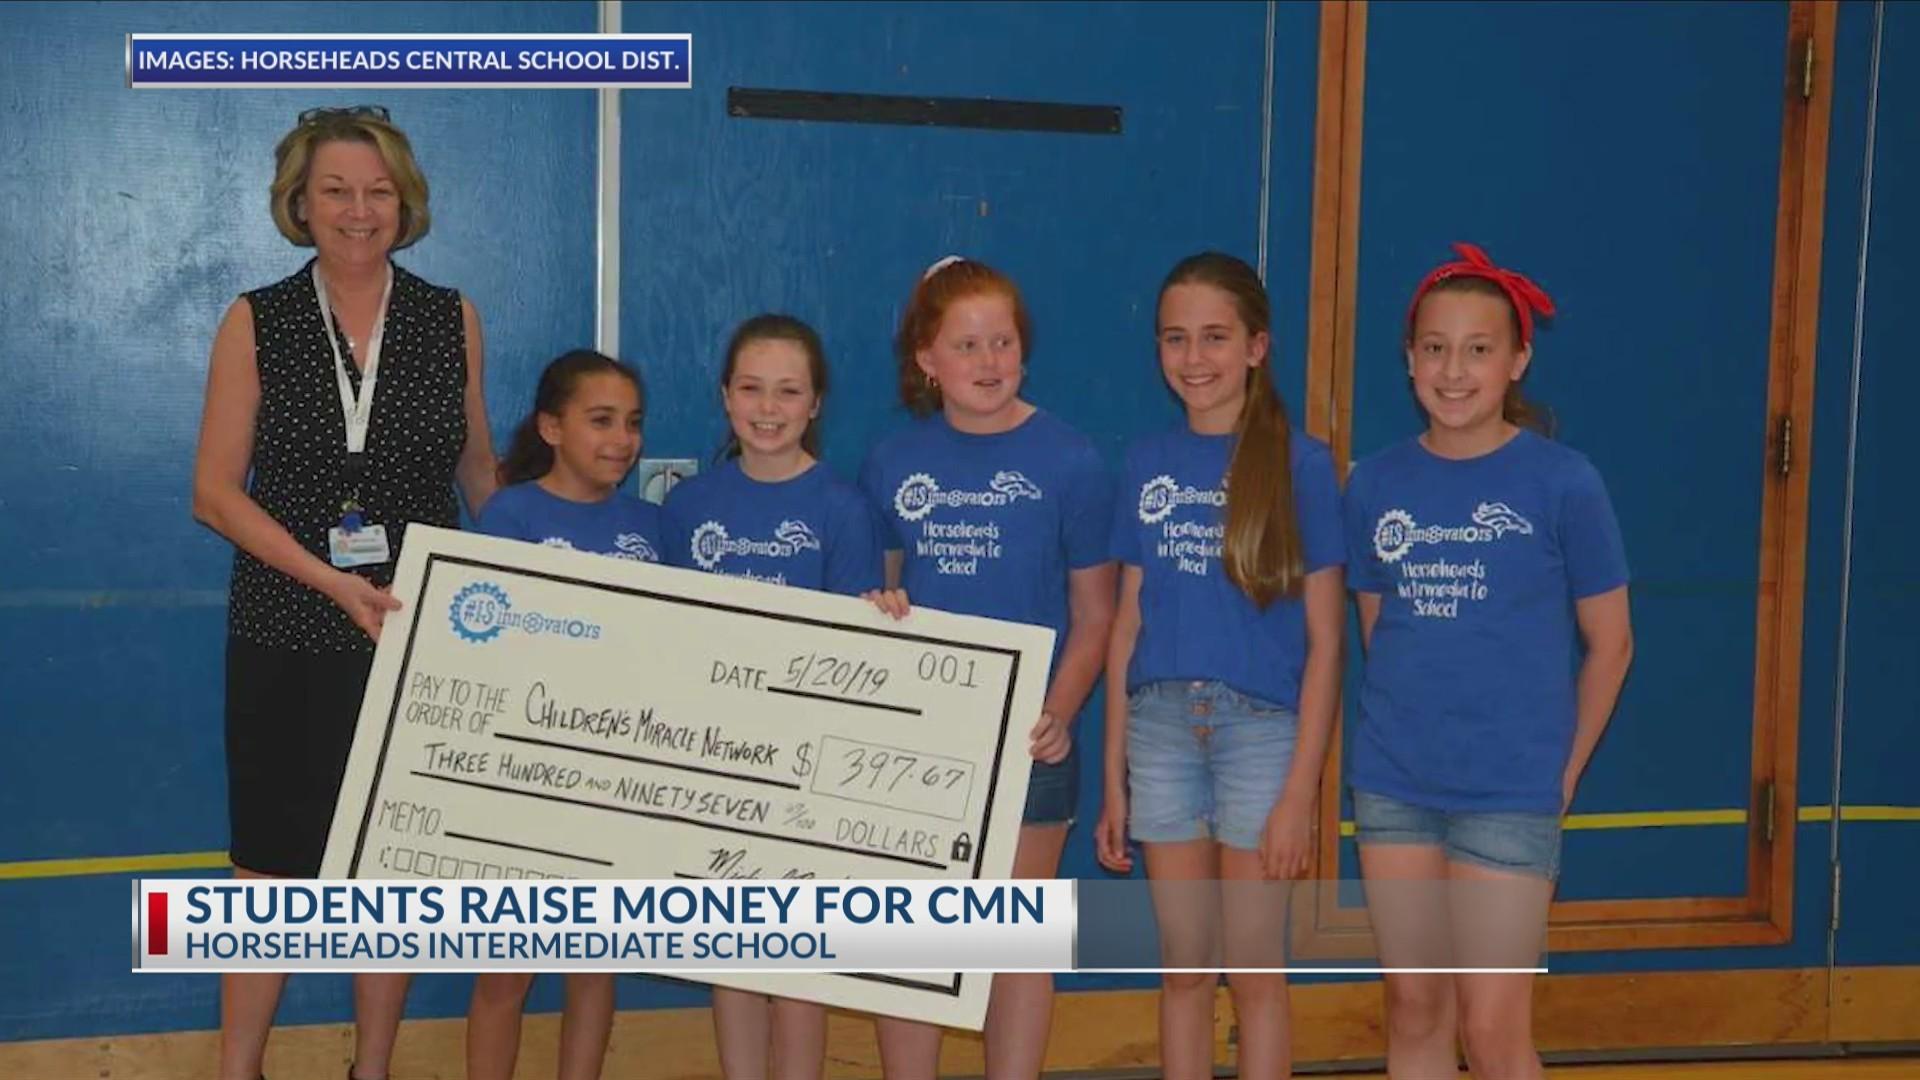 Students raise money for CMN